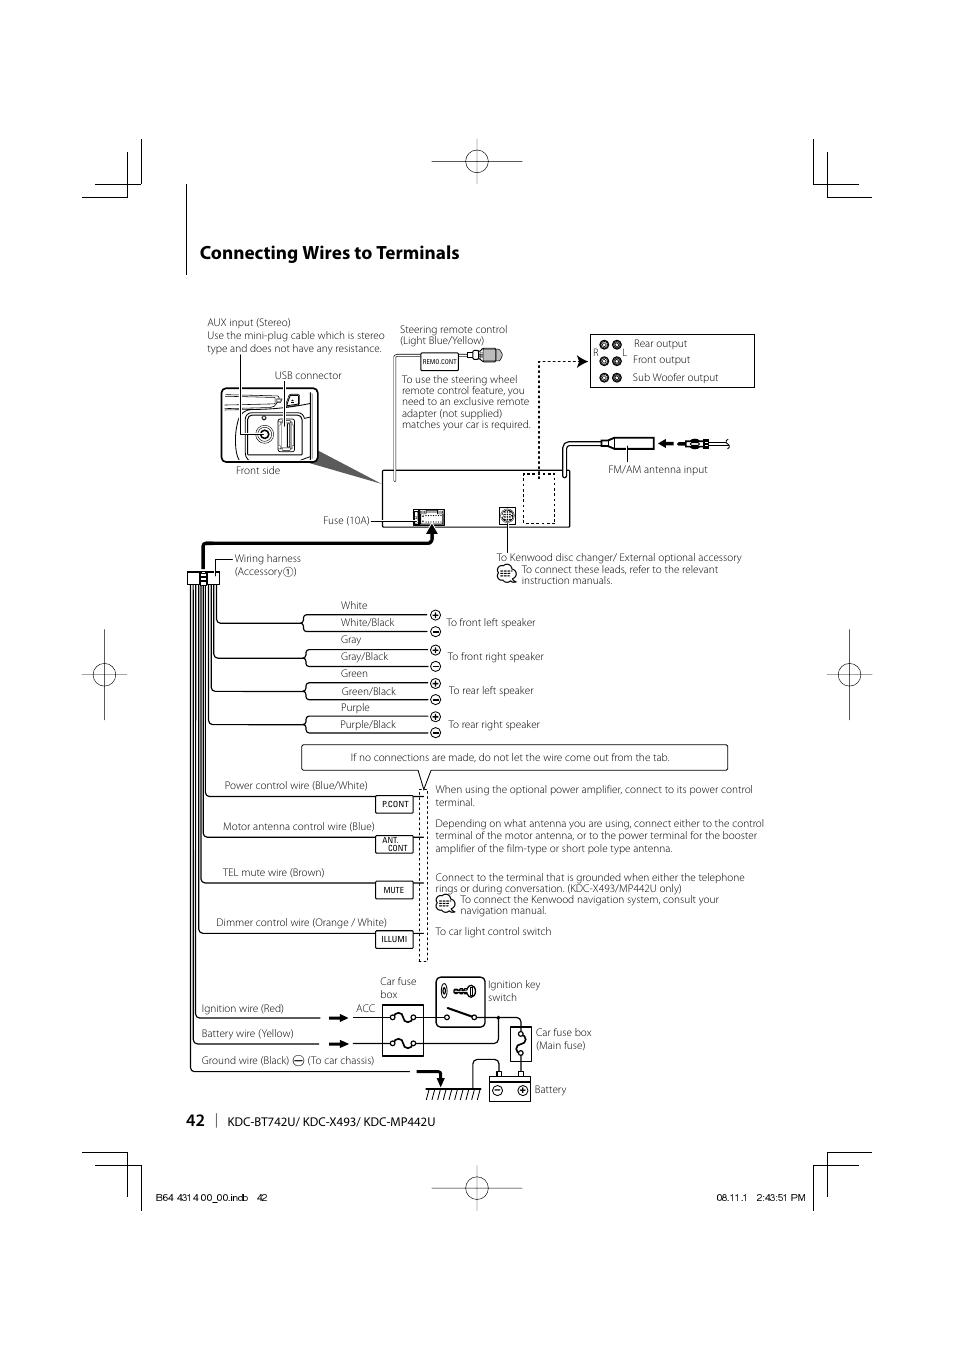 Diagram Kdc 352u Wiring Diagram Full Version Hd Quality Wiring Diagram Mcowiring4706 Eliasvapo It